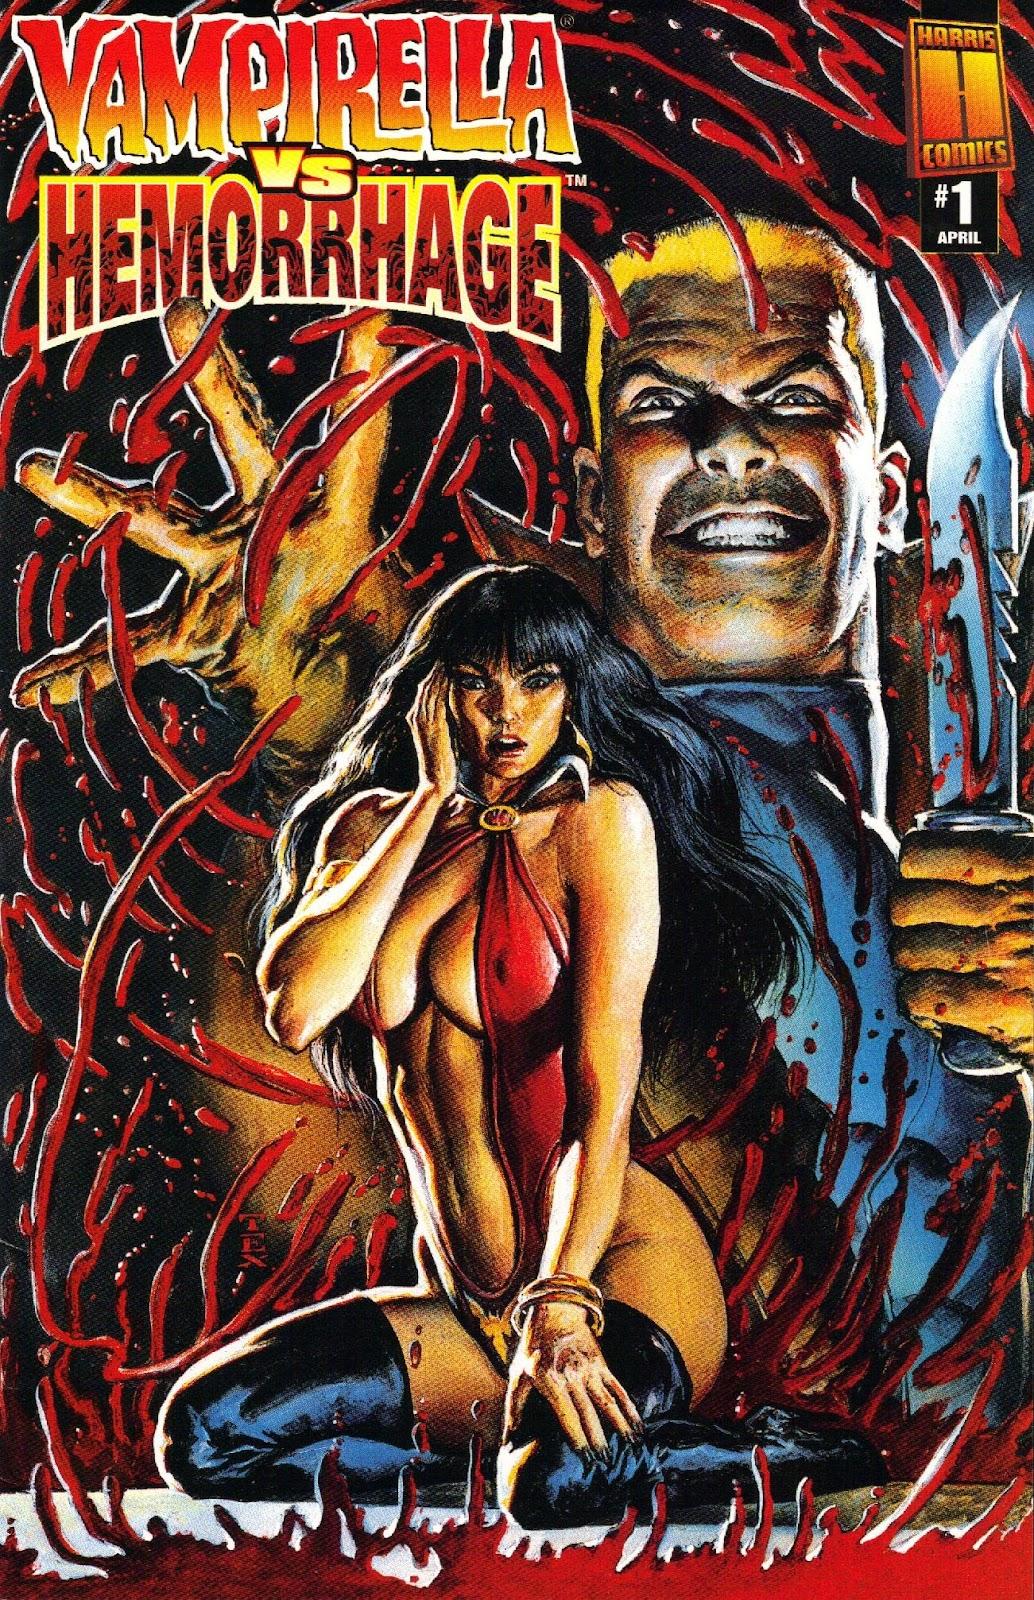 Vampirella vs Hemorrhage issue 1 - Page 1